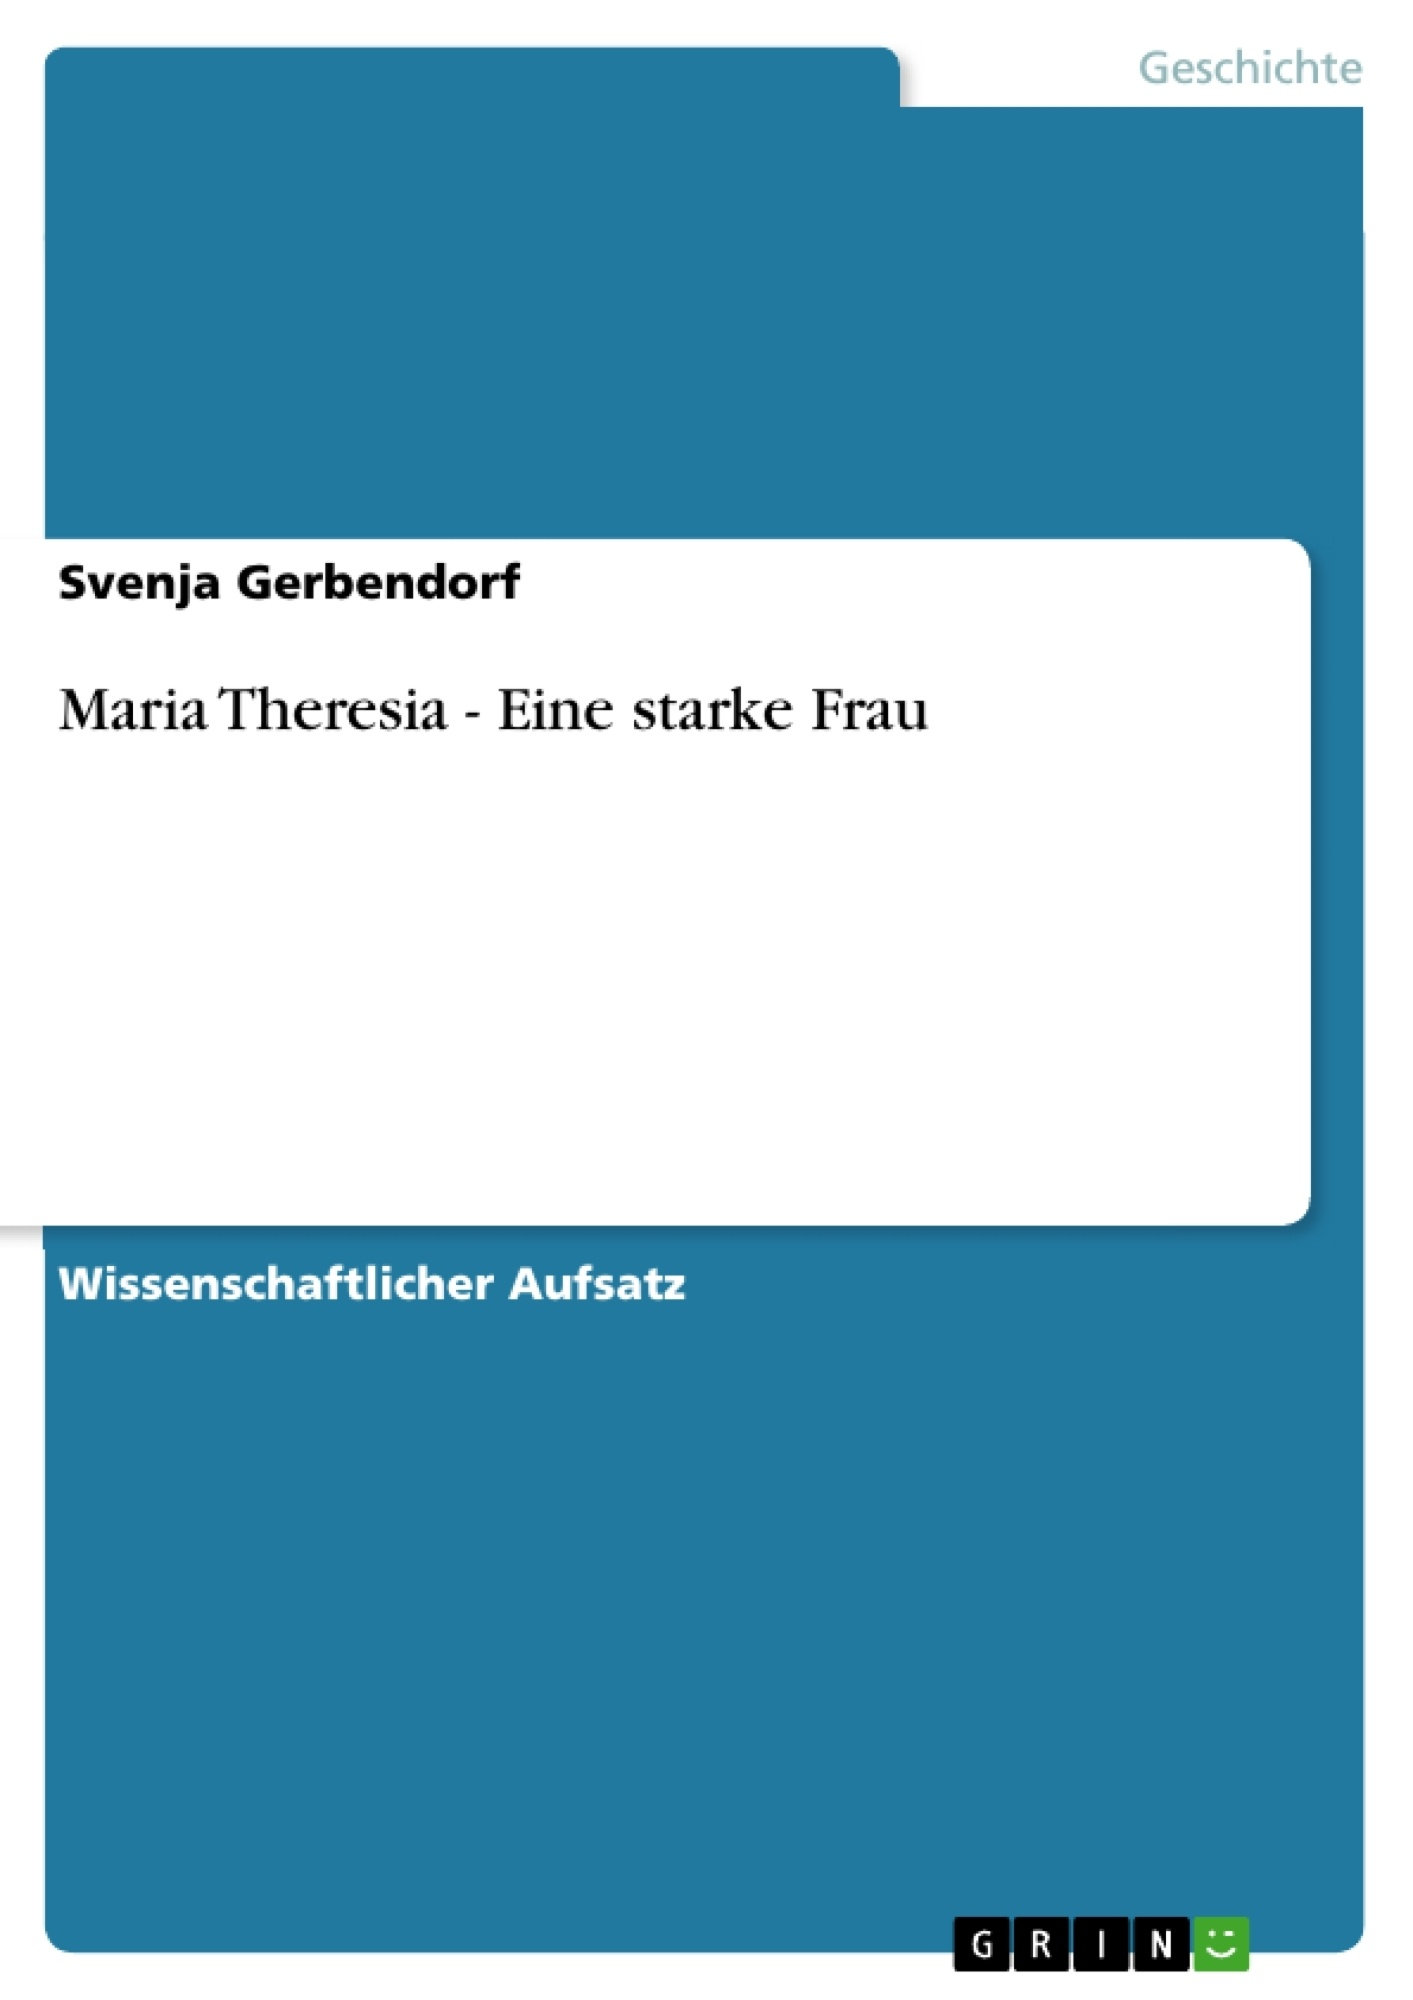 Titel: Maria Theresia - Eine starke Frau